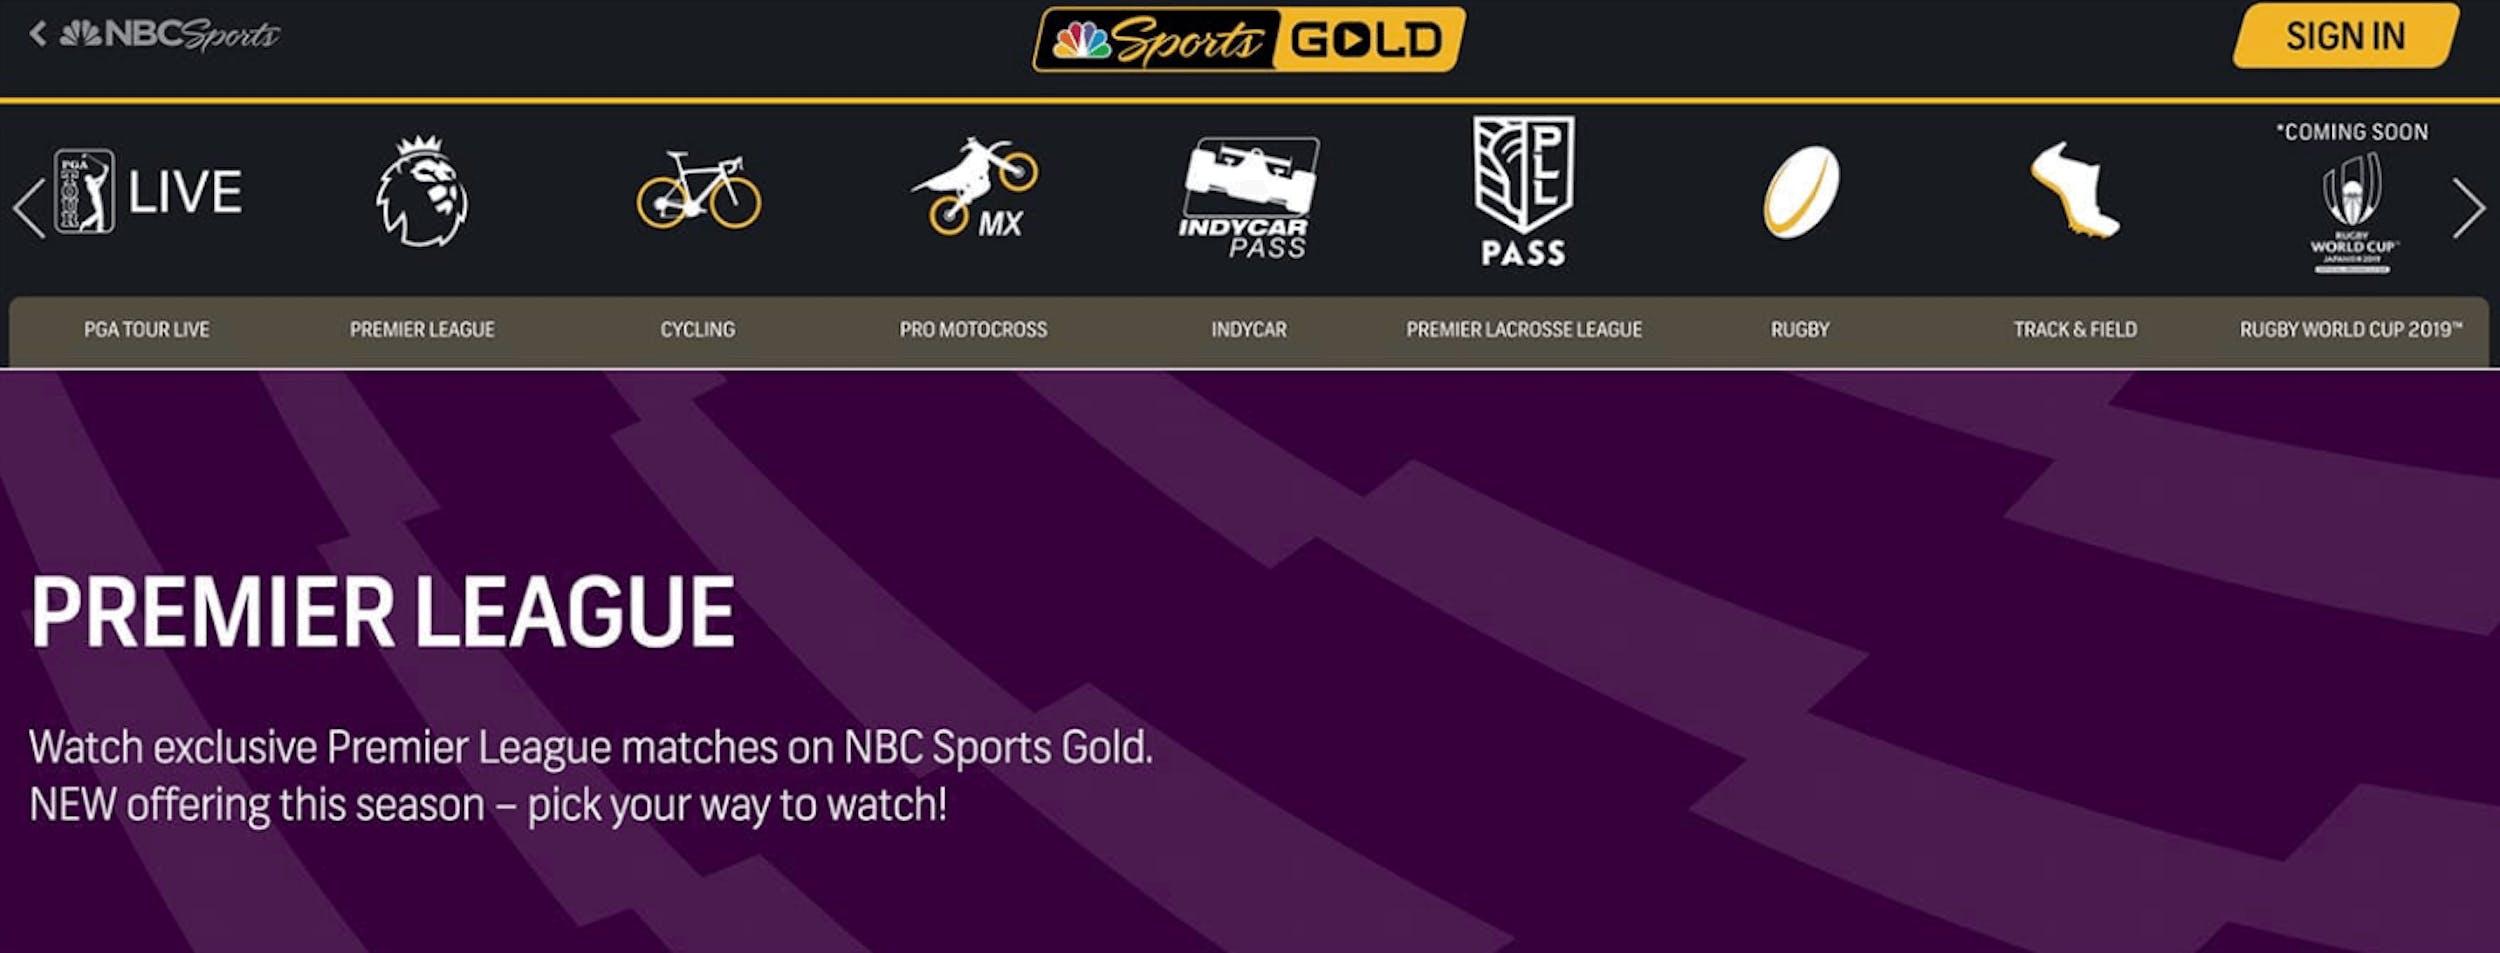 man city vs newcastle live stream nbc sports gold